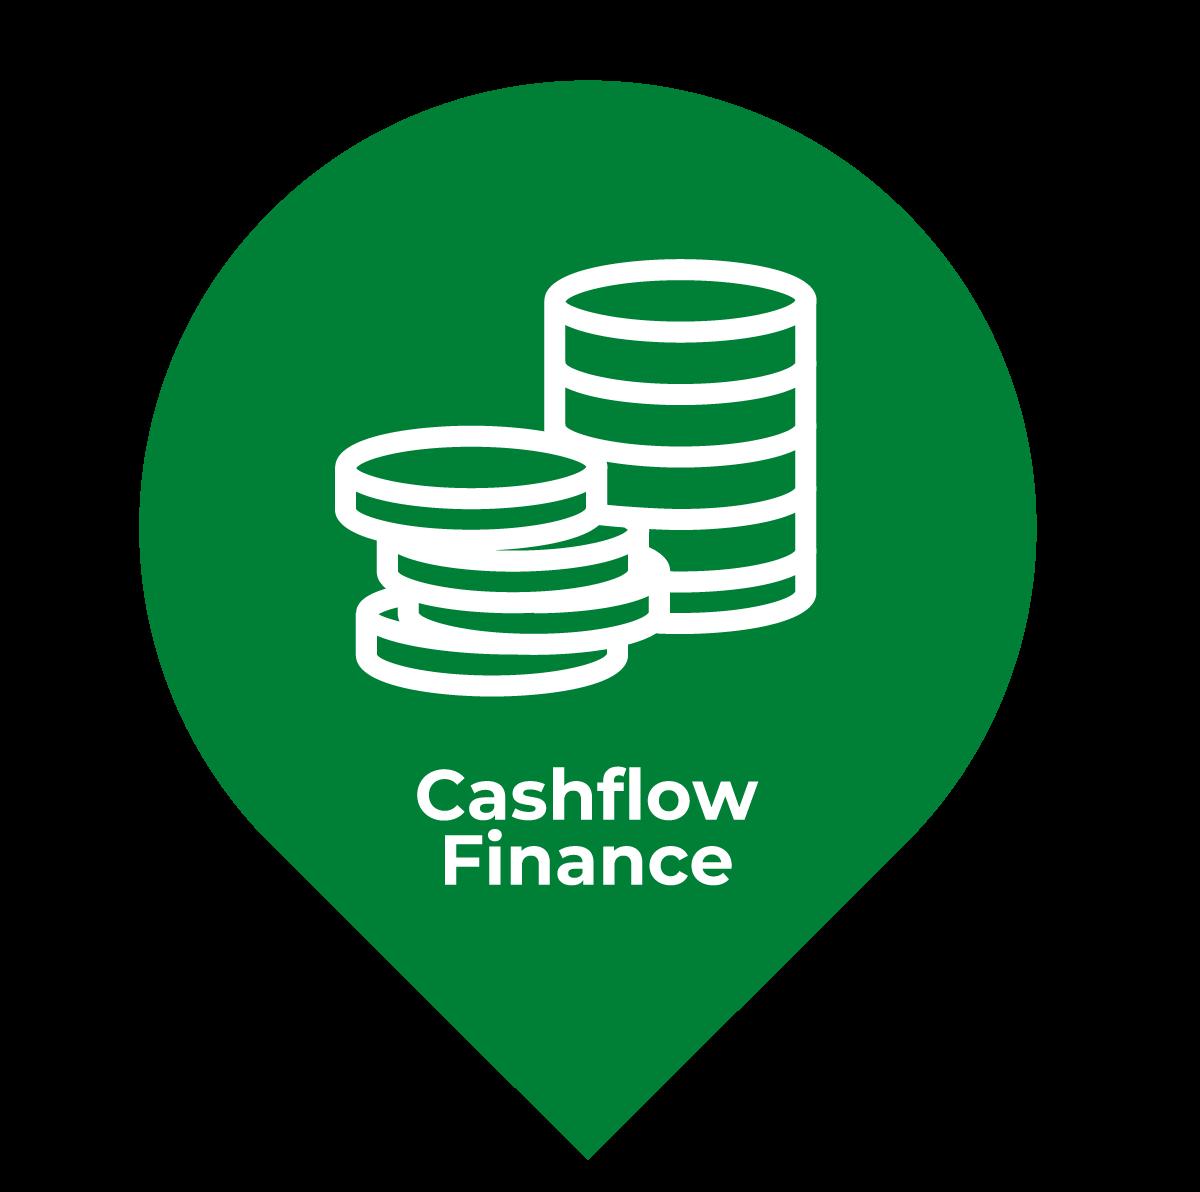 UK Adviser - Cashflow Finance